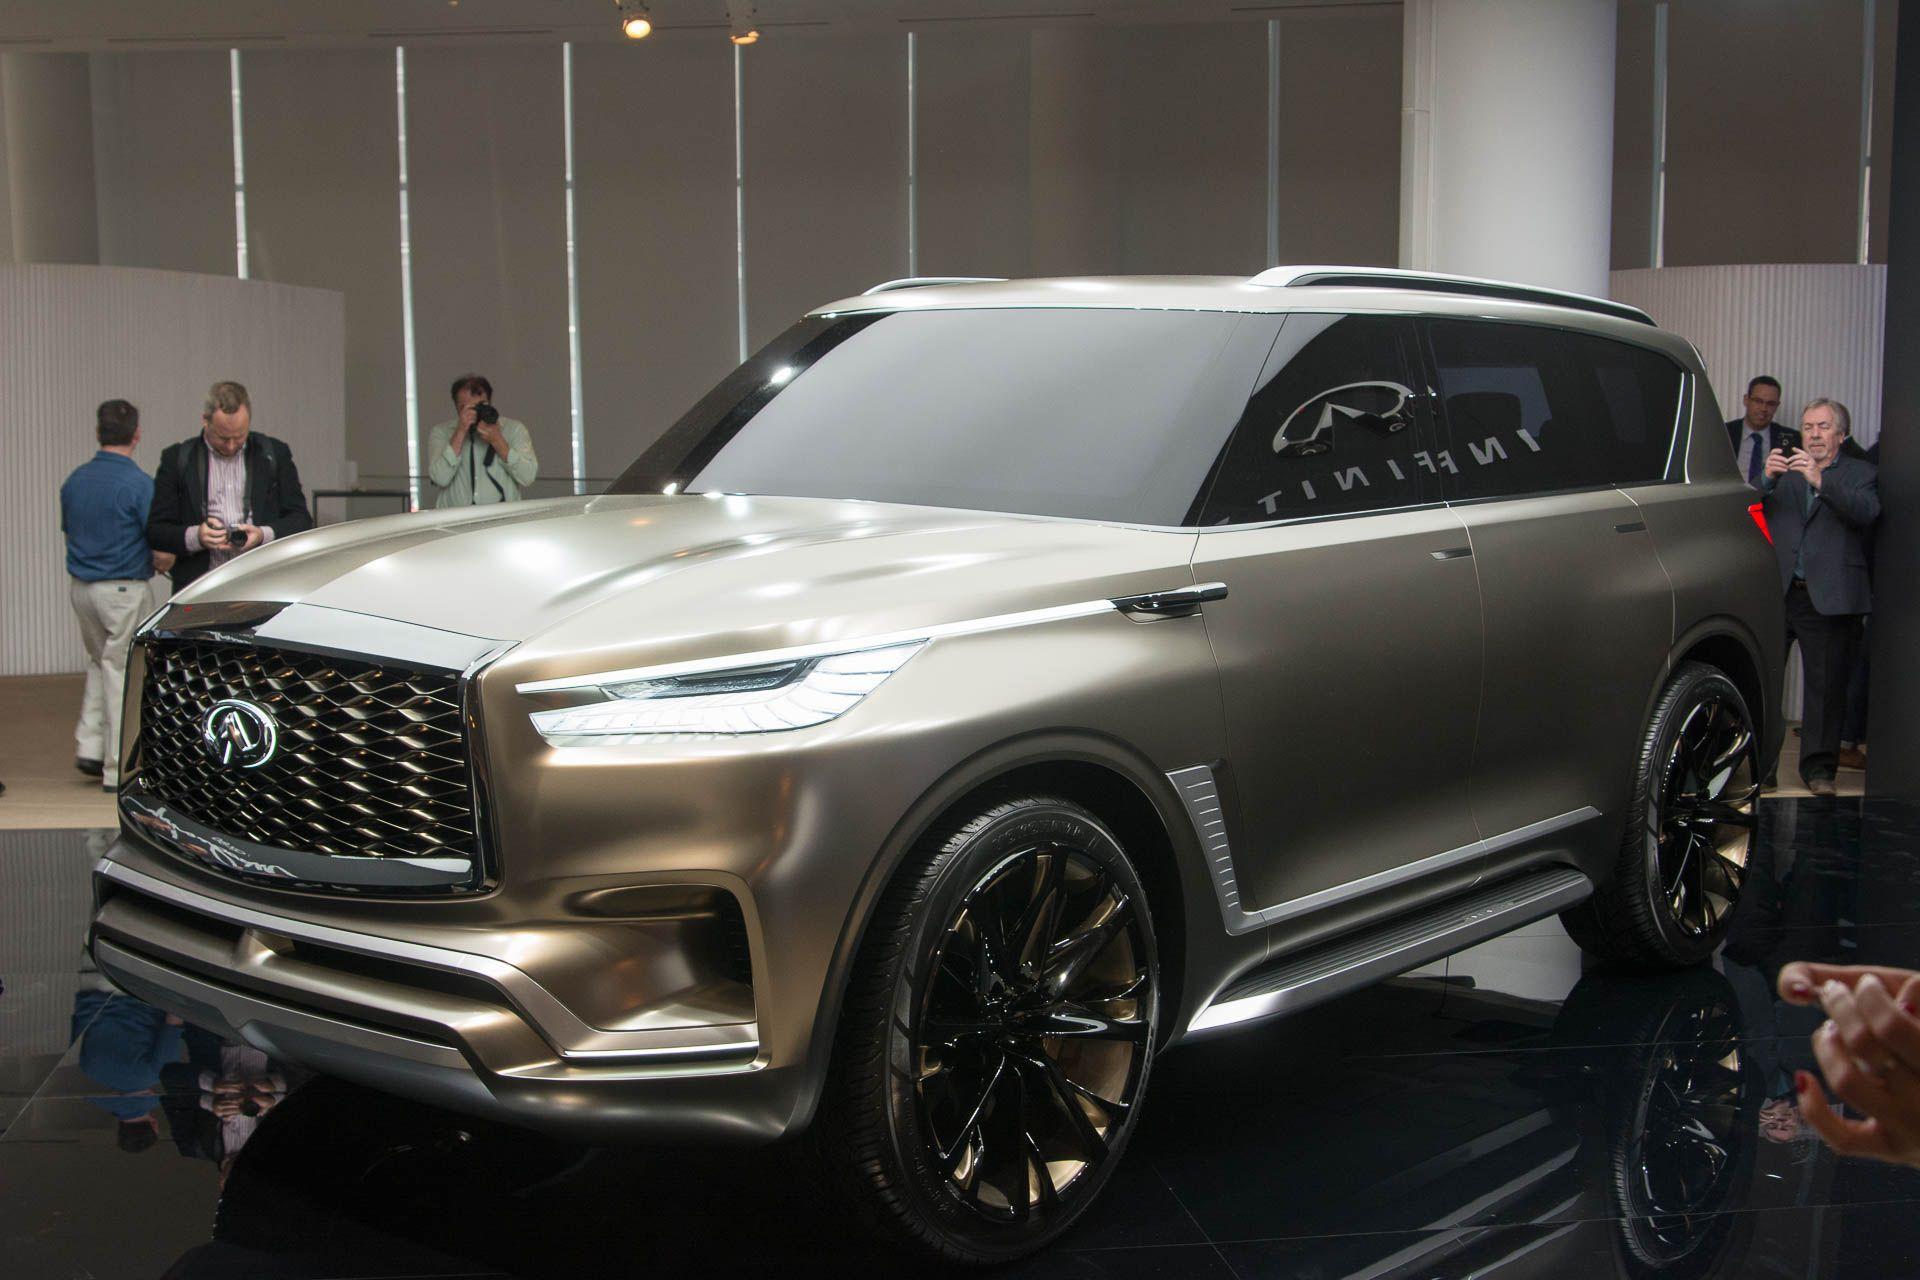 2020 Infiniti Qx80 Suv Cakhd Cakhd Luxury Suv Luxury Cars Audi New Infiniti